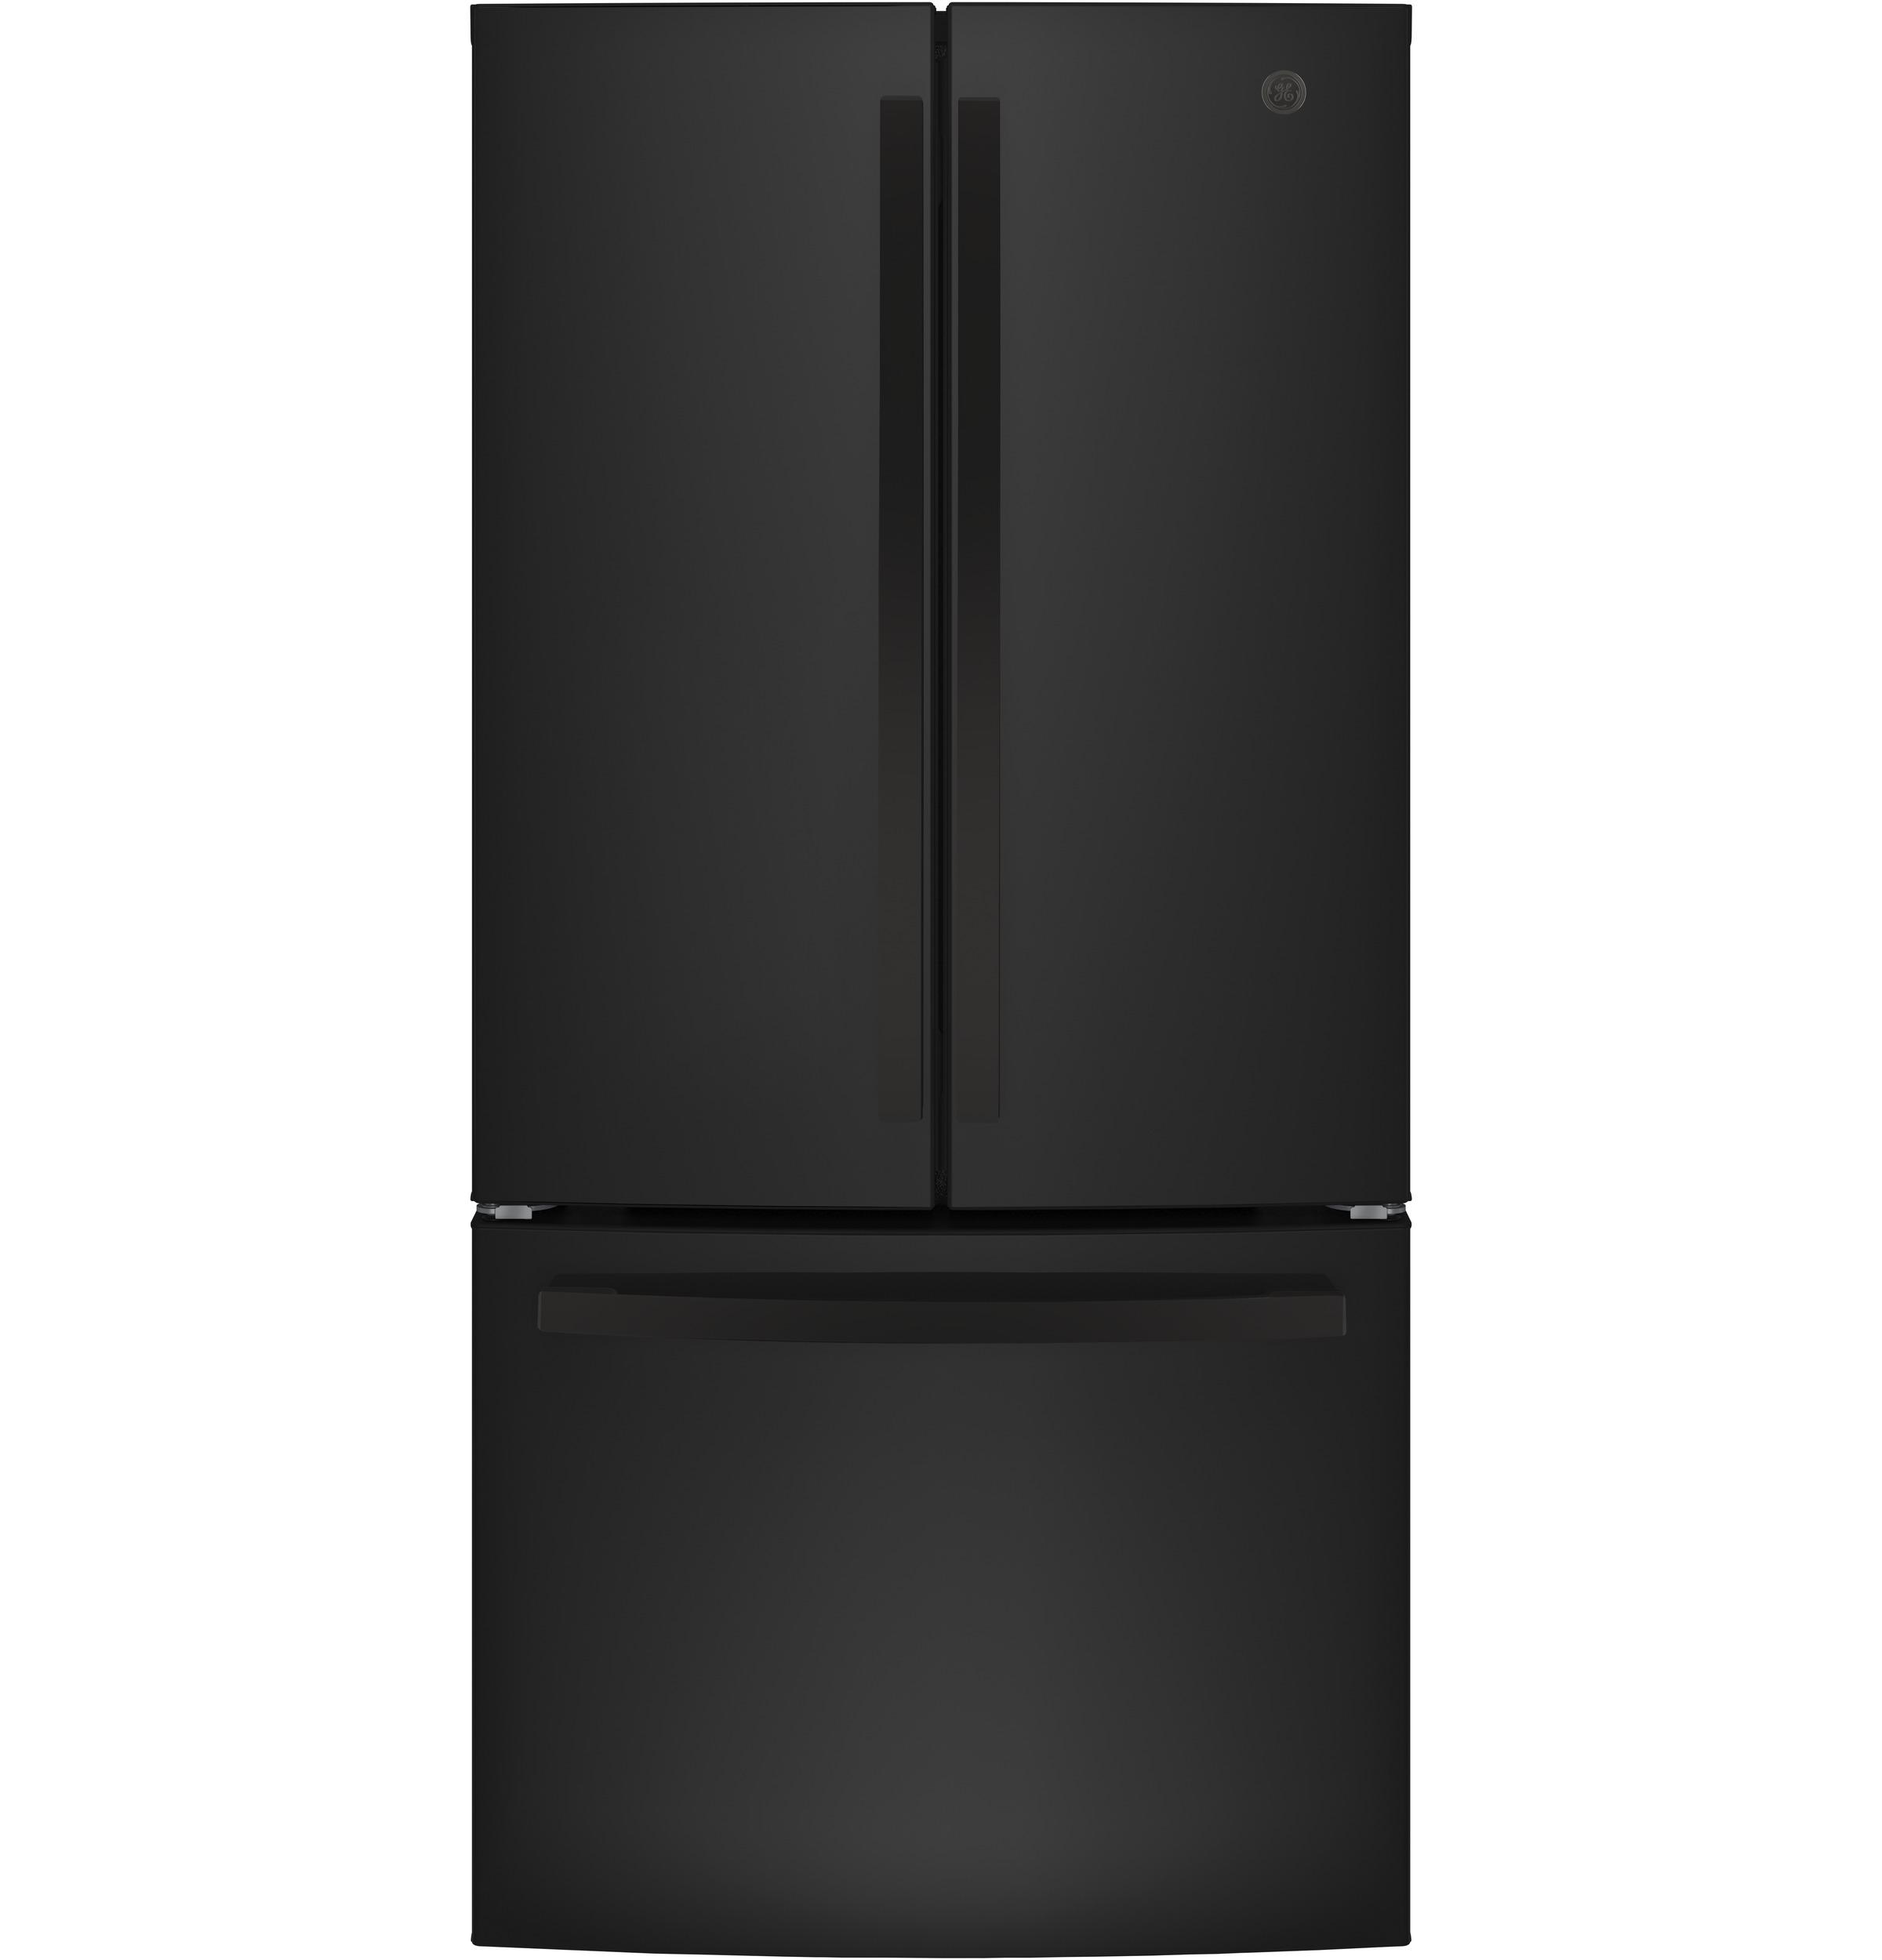 GE GE® ENERGY STAR® 18.6 Cu. Ft. Counter-Depth French-Door Refrigerator